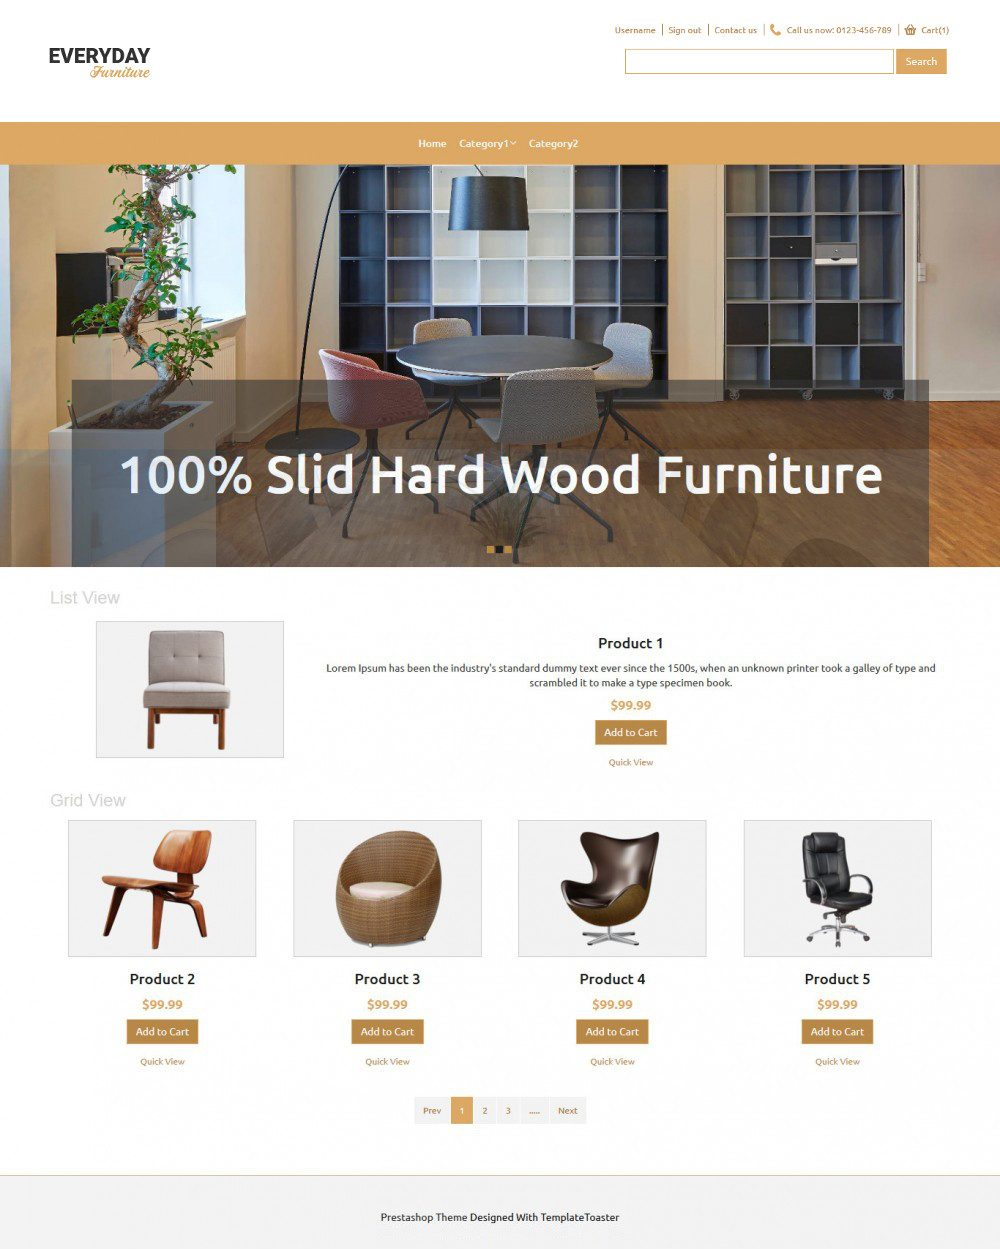 Everyday Furniture Virtuemart Template